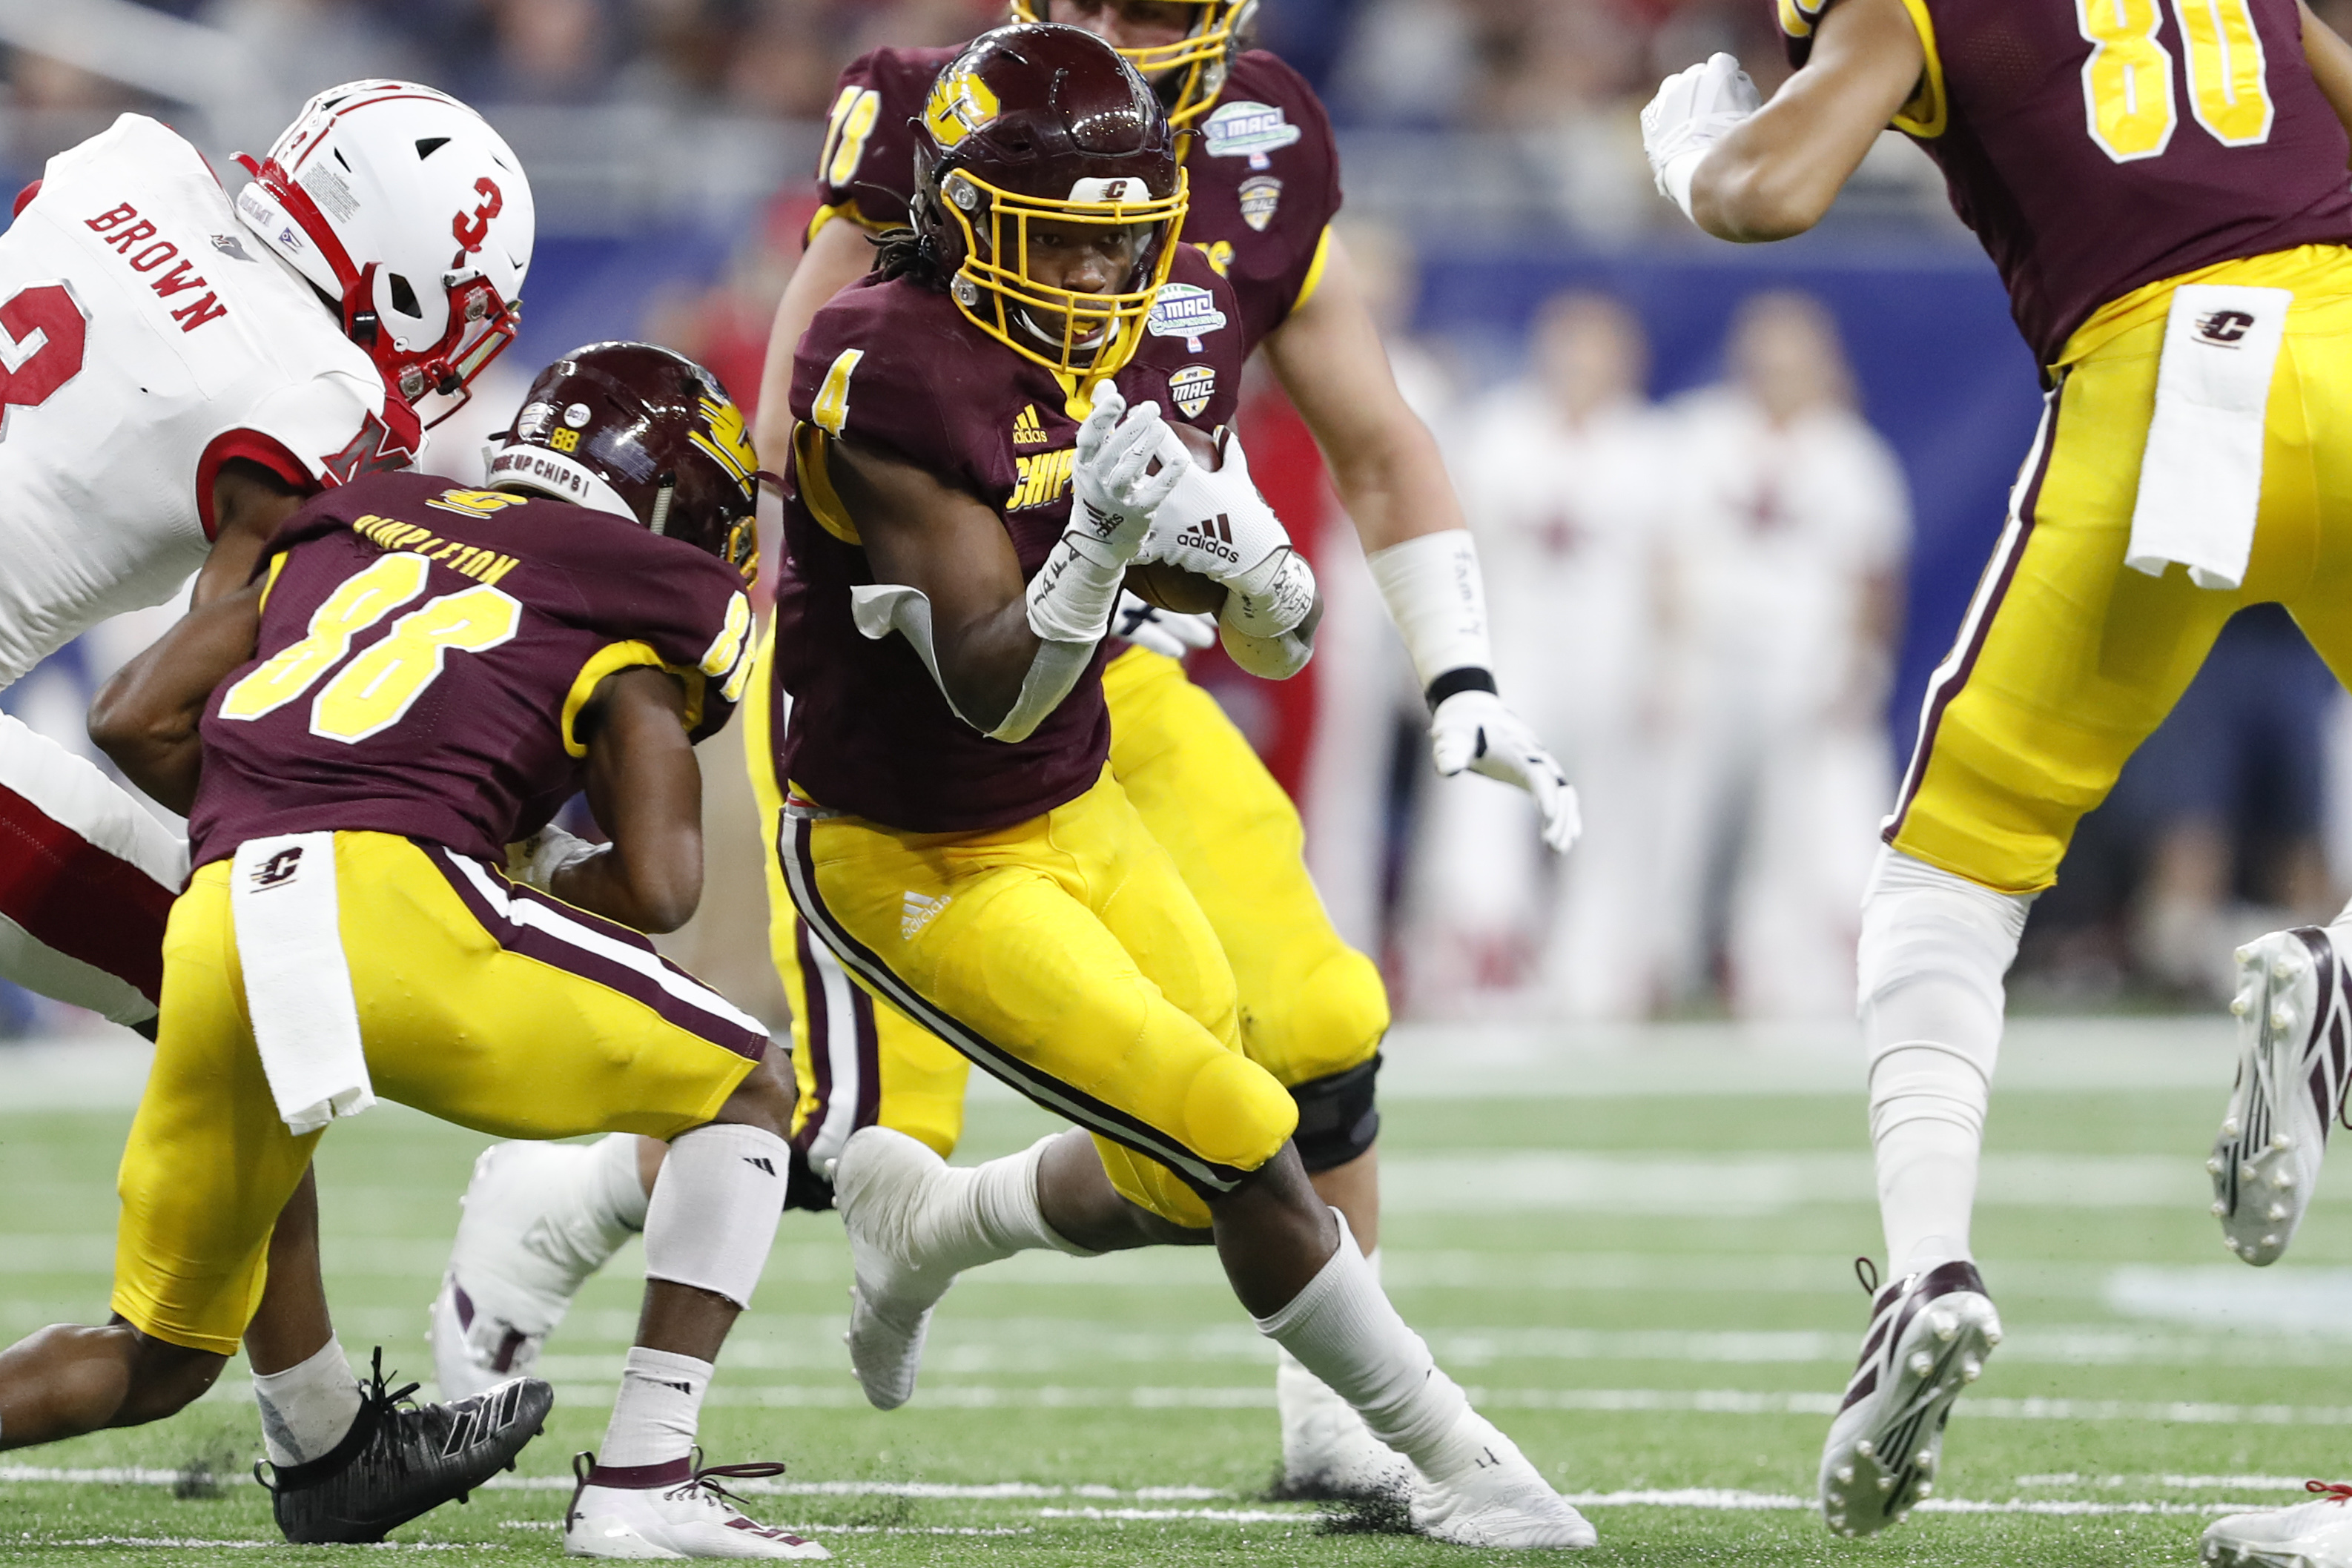 NCAA橄榄球赛:迈阿密(俄亥俄州)在密歇根州中部